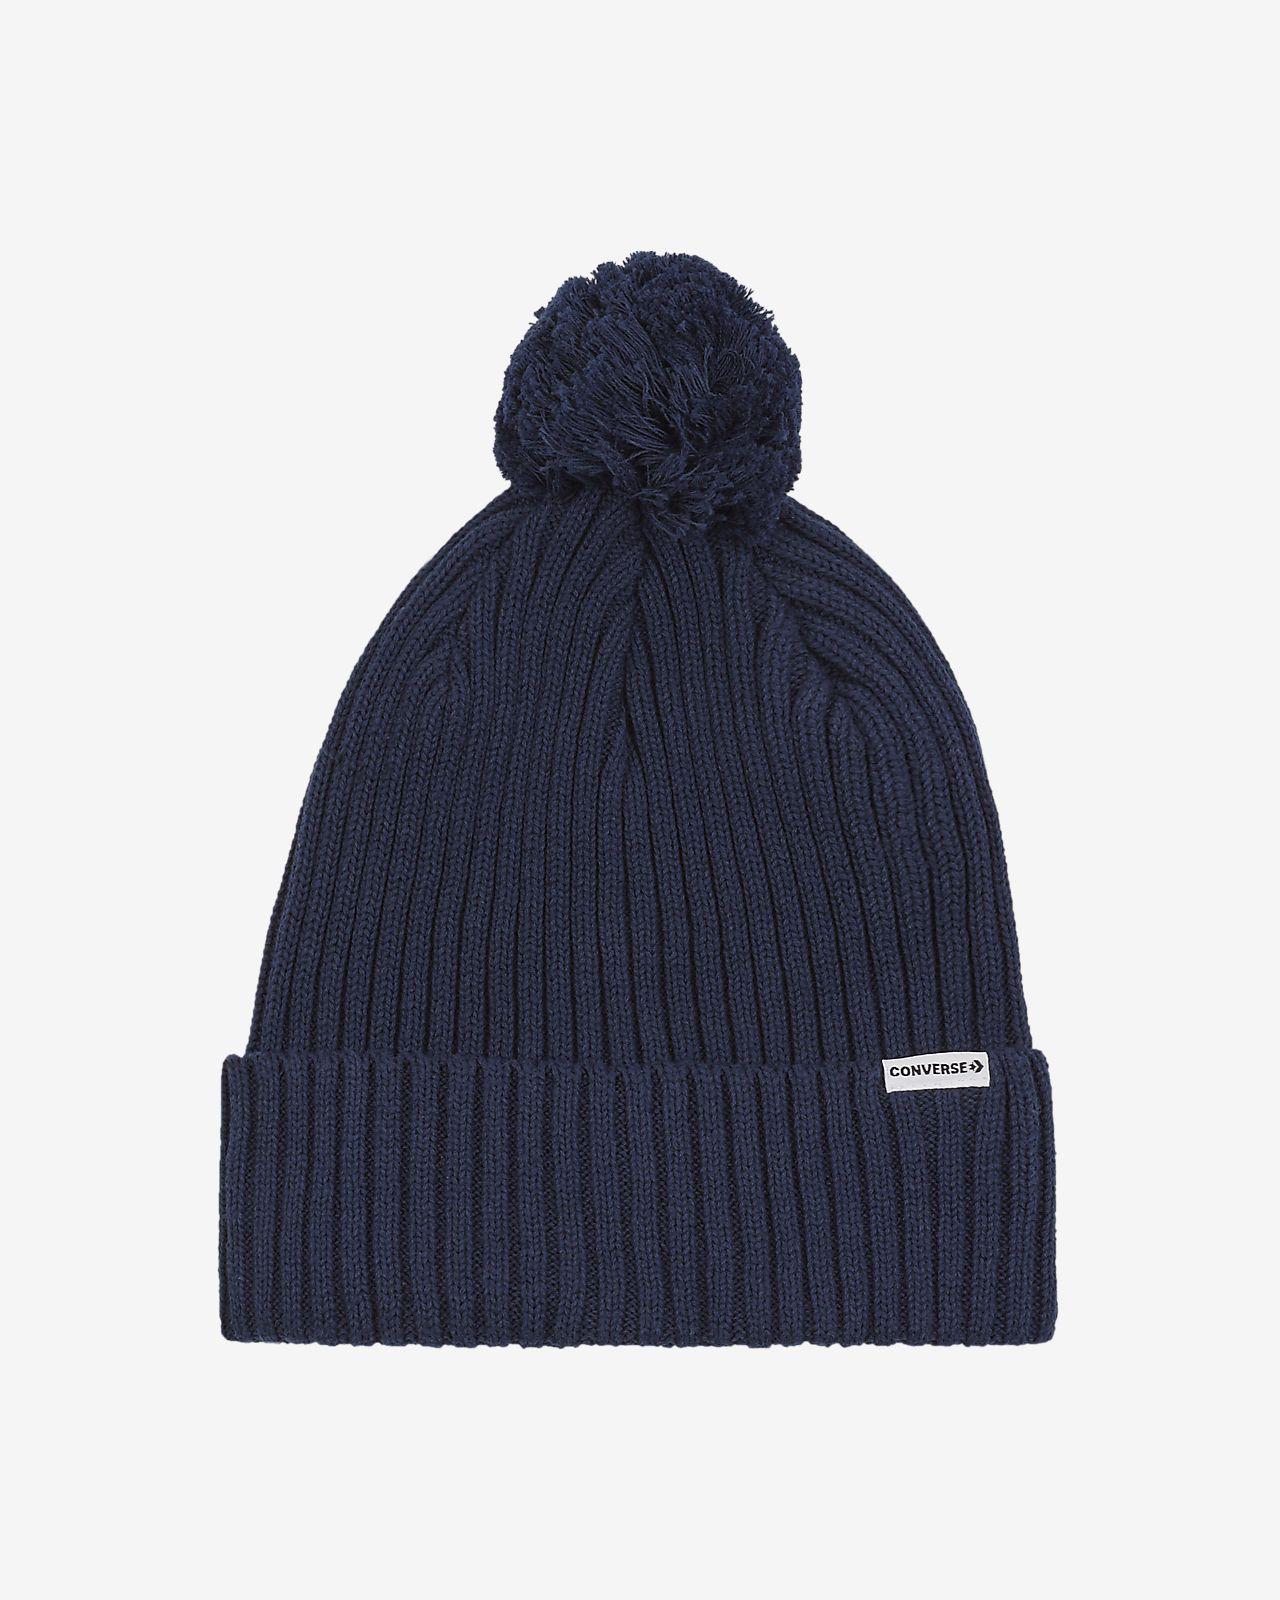 ... Hat  Converse Rib Knit Pom Unisex Beanie  Product Image · Nike Men s  Sportswear ... 2fce5ad8e6de